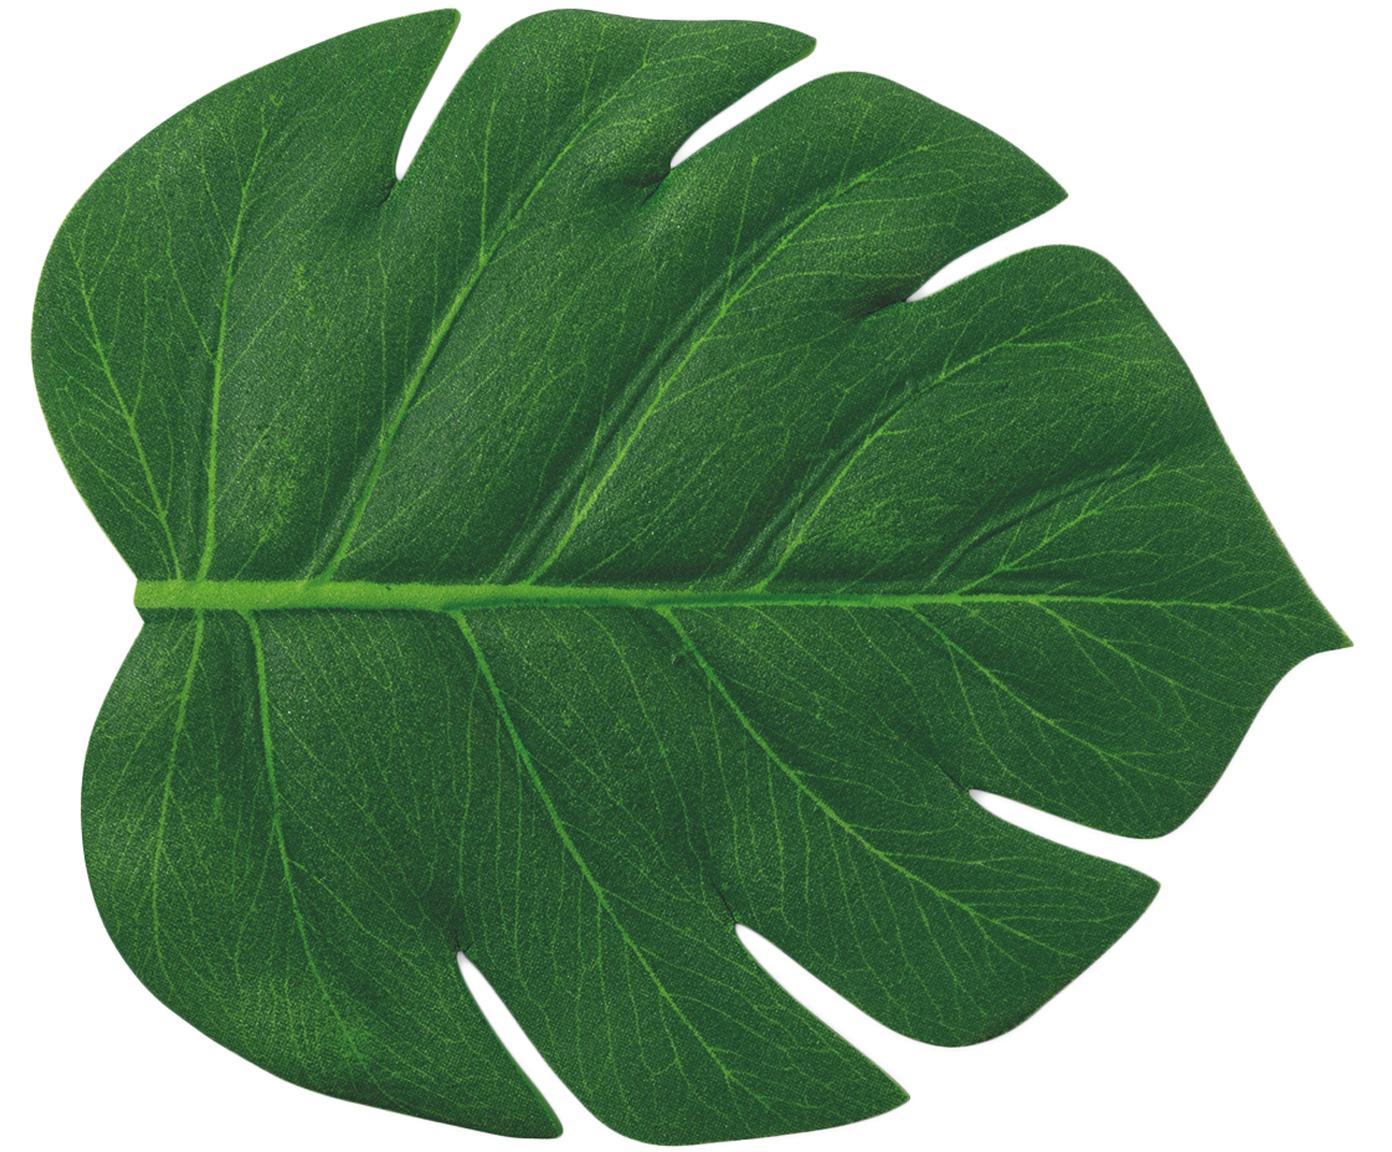 Posavasos de plástico Jungle, 6uds., Plástico, Verde, An 12 x L 14 cm